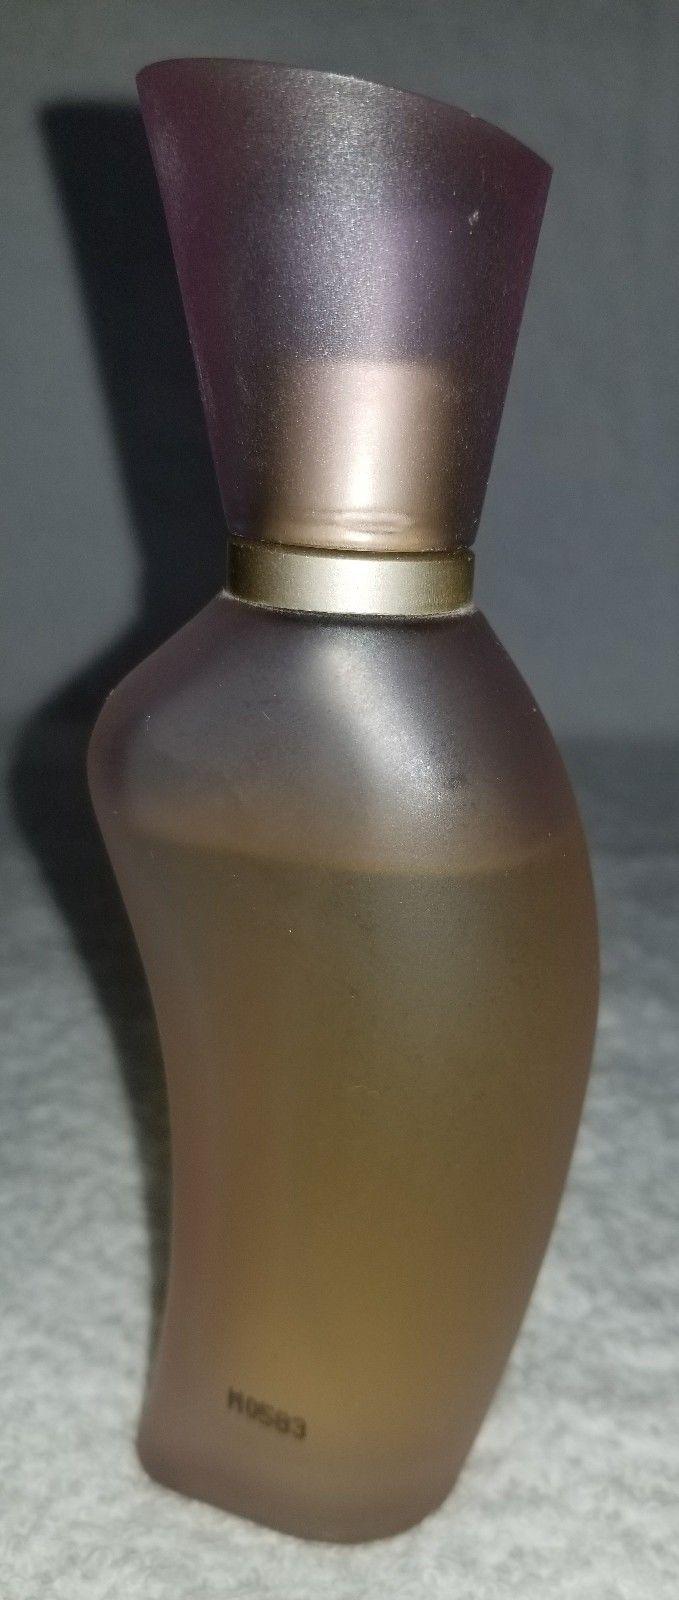 Avon SANDI Eau De Cologne EDC Spray Women 1.7 oz/50mL USED 95% Full Discontinued